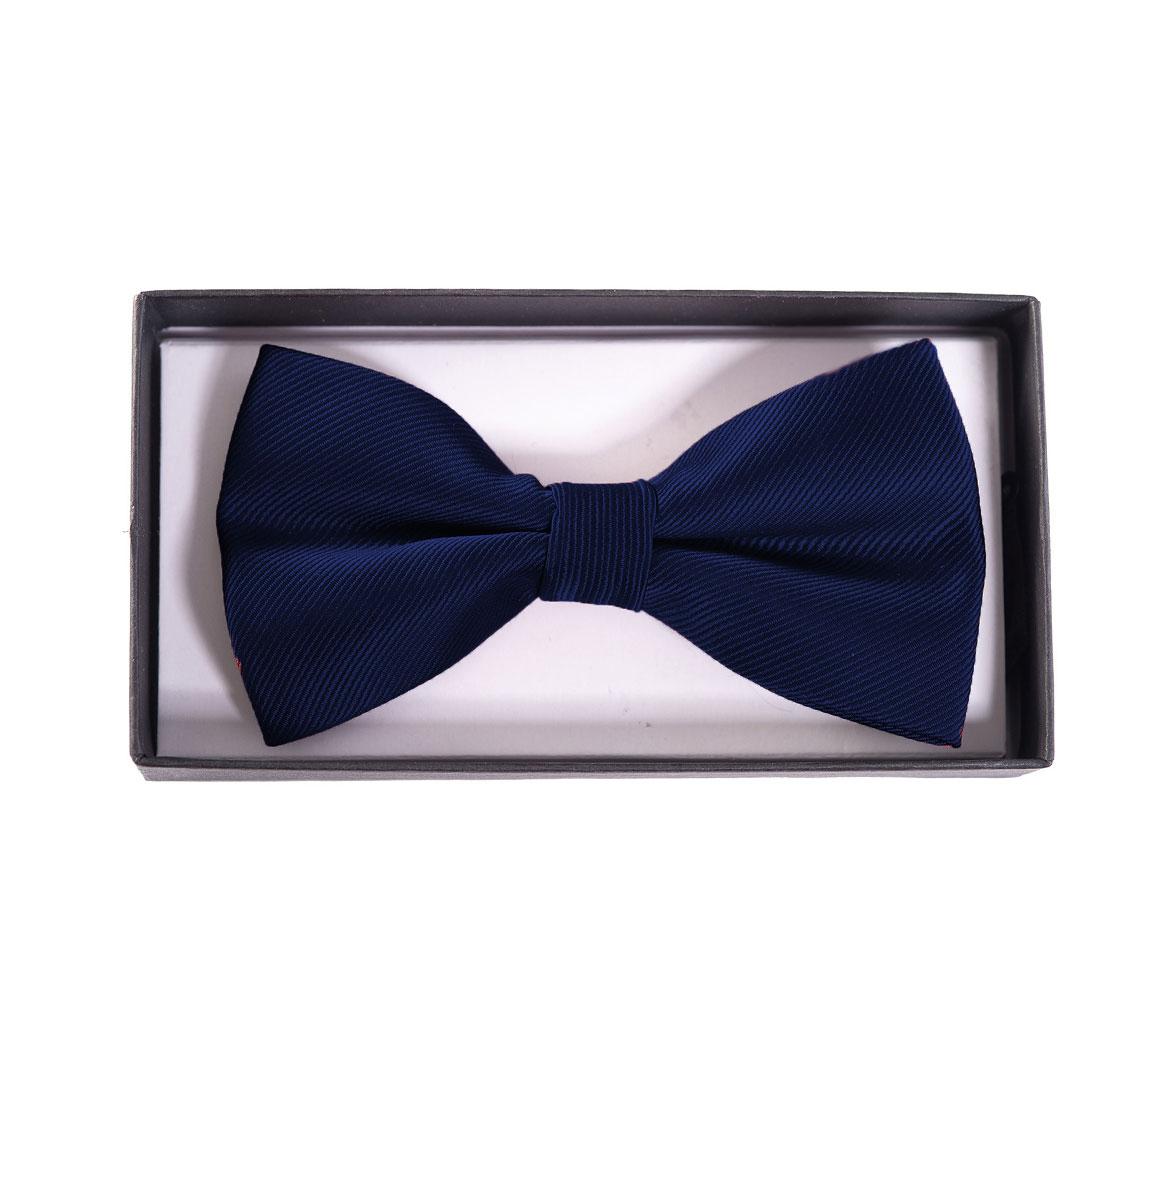 Banned Ribbon Dance Bow Tie Strik Navy